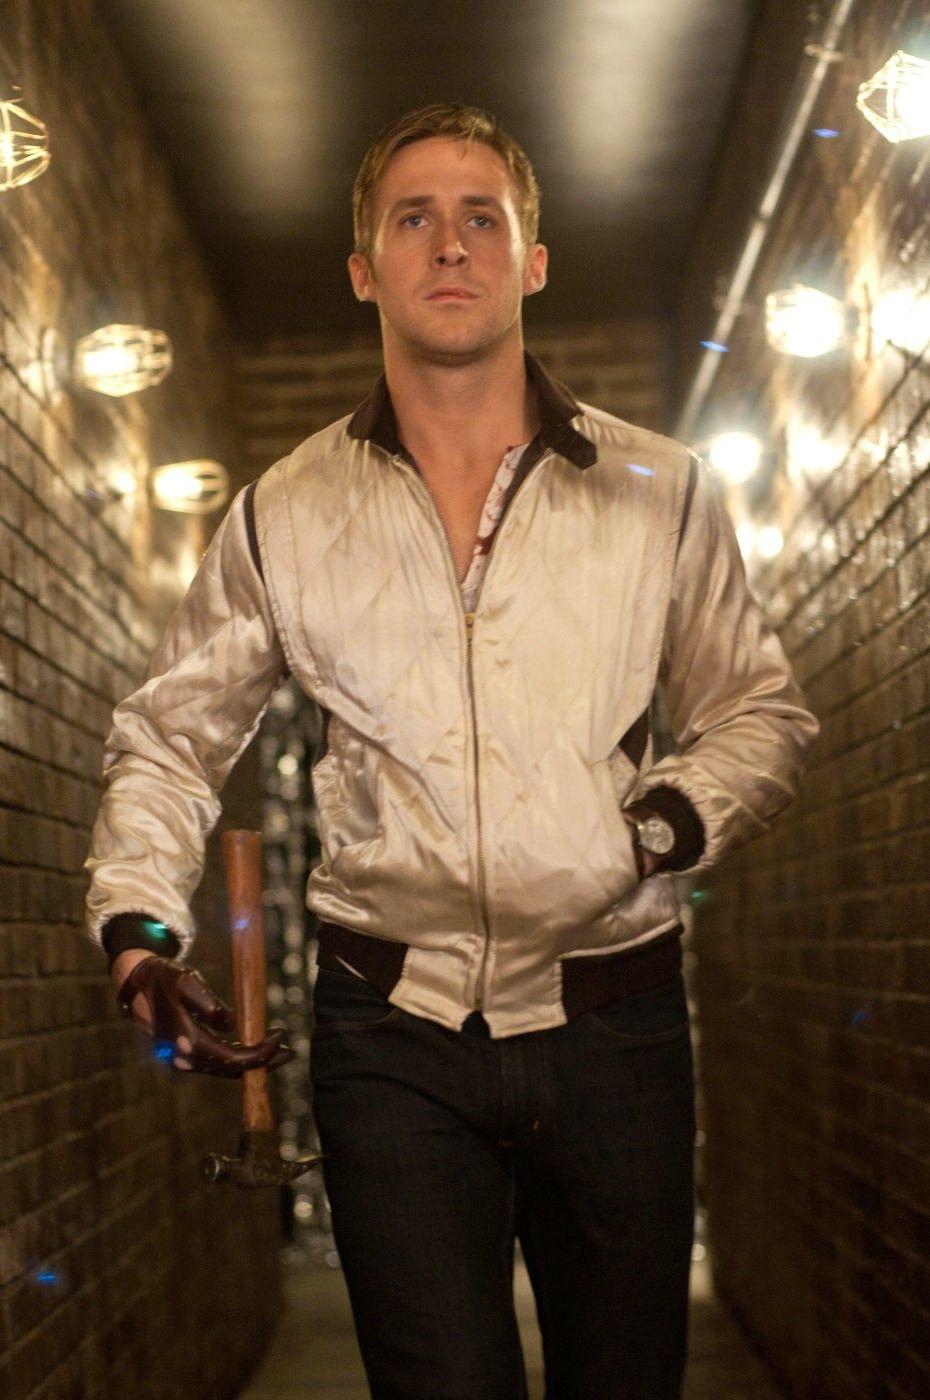 Pin By Luella Spark By Vanessa Schoth On Fashion In Film Ryan Gosling Drive Hey Girl Ryan Gosling Ryan Gosling